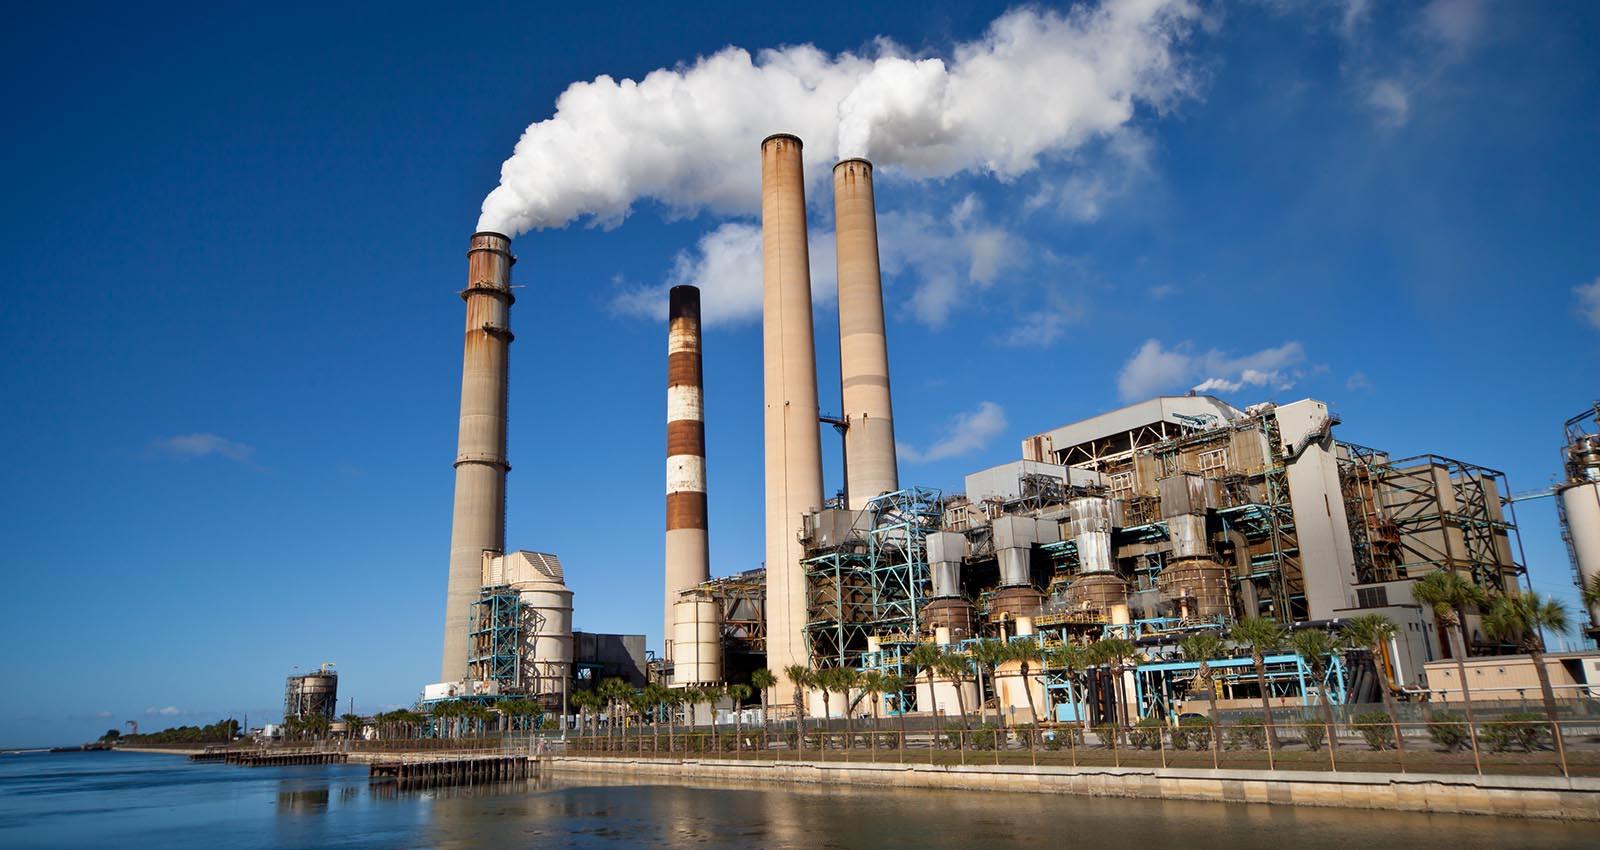 Autorizzazione Integrata Ambientale AIA garanzie finanziarie